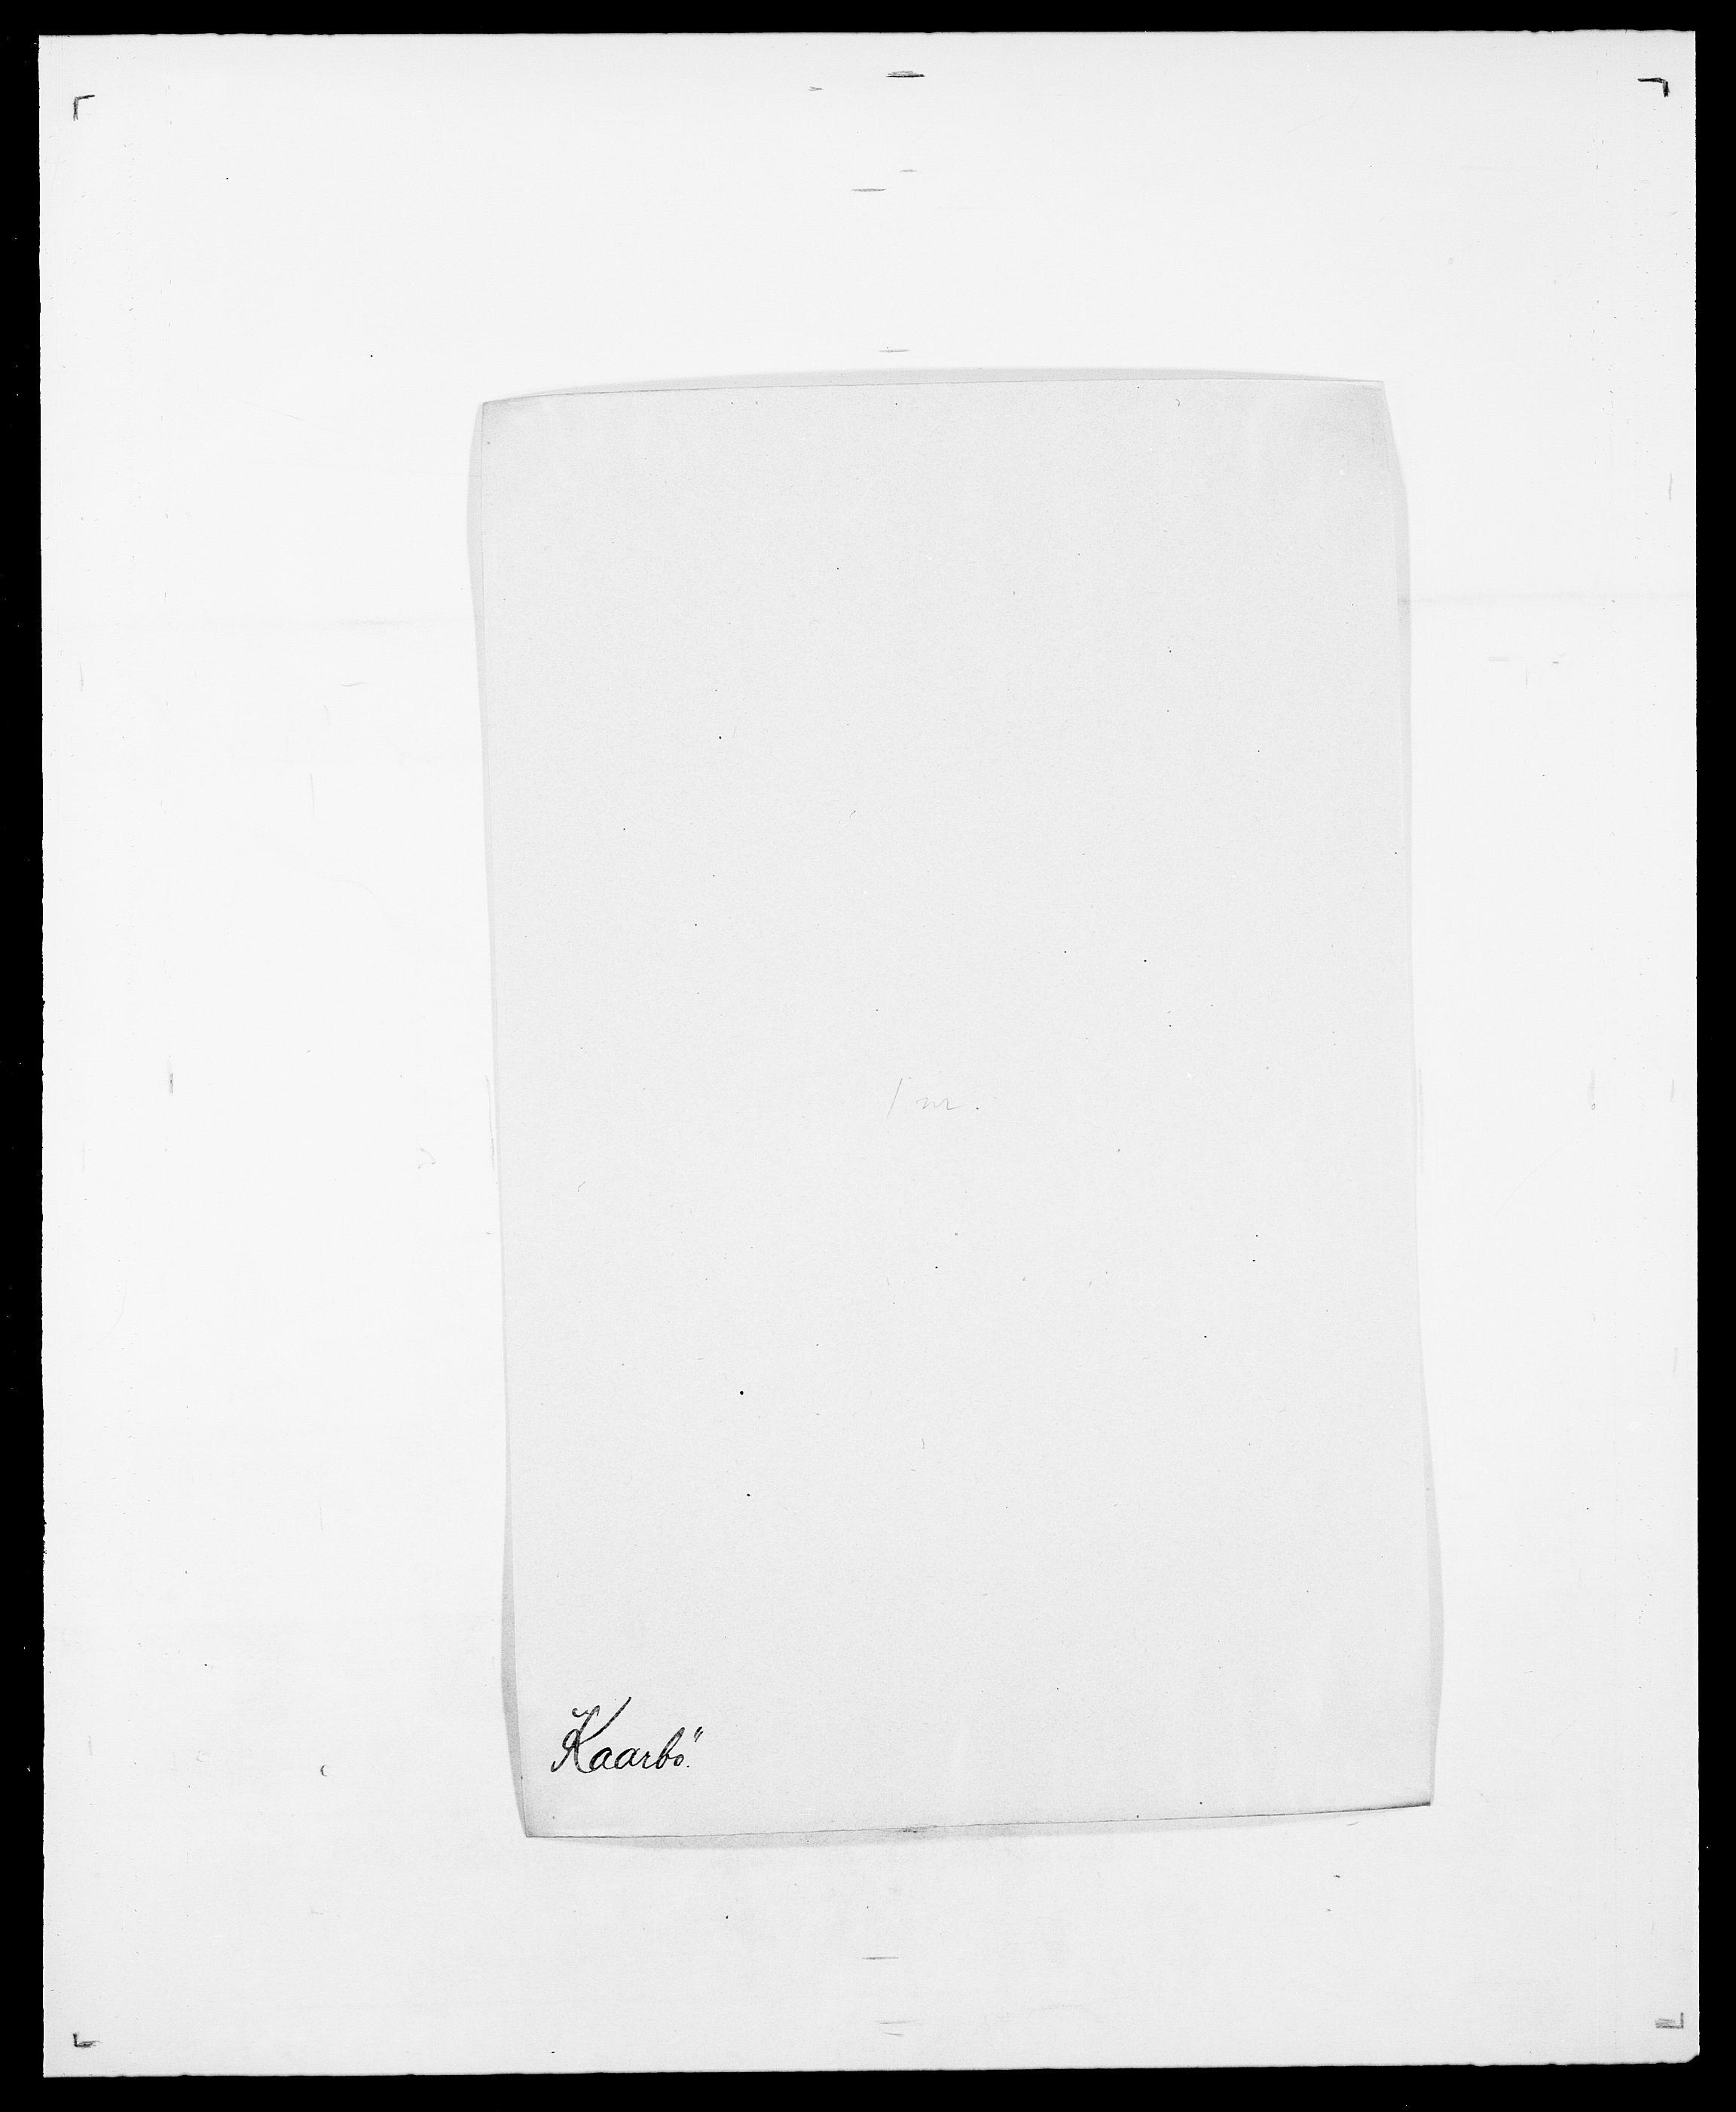 SAO, Delgobe, Charles Antoine - samling, D/Da/L0020: Irgens - Kjøsterud, s. 370